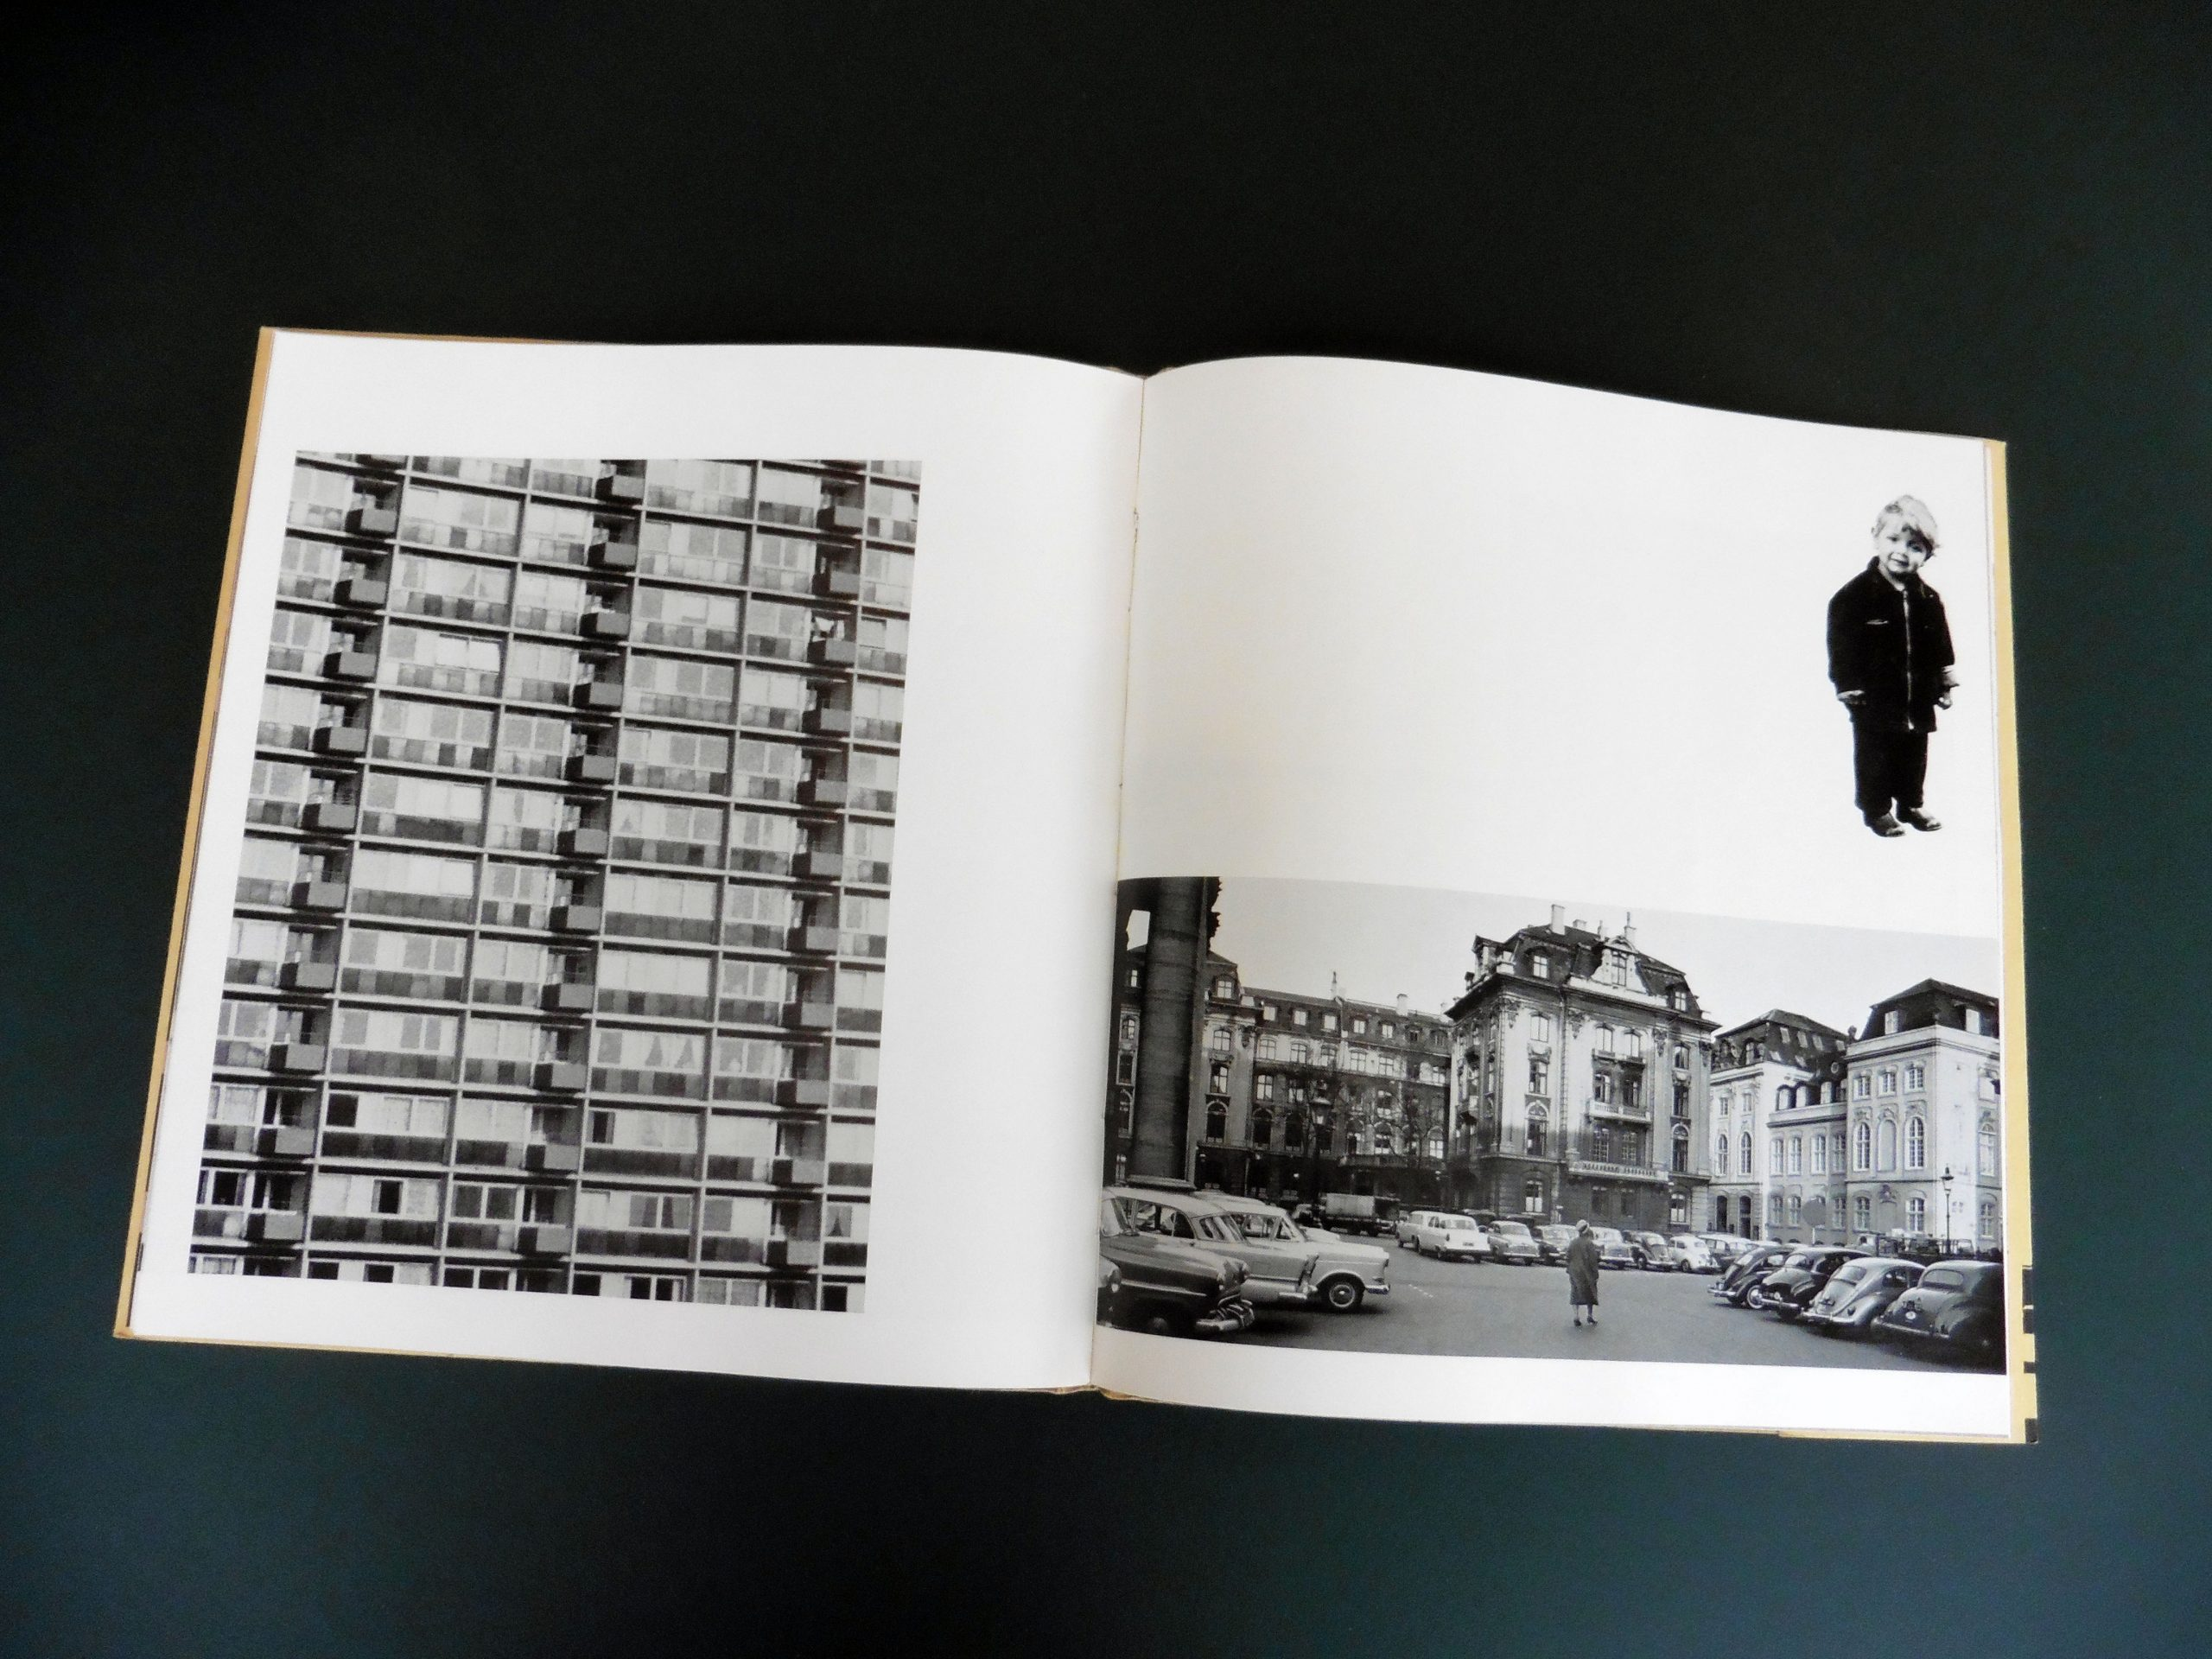 Danish Welfare Architecture and Its Image